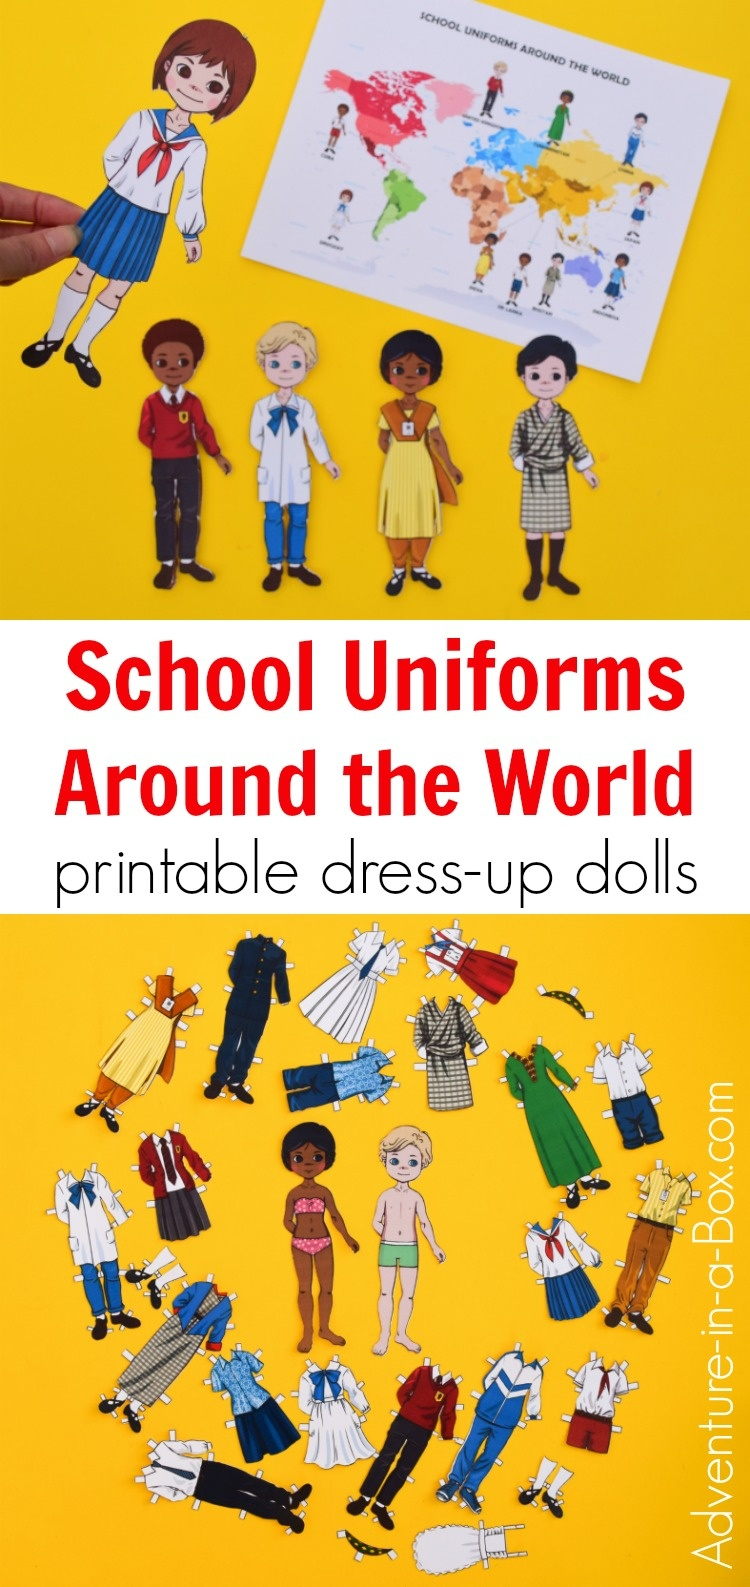 School Uniforms Around The World: Printable Dress-Up Paper Dolls - Free Printable Paper Dolls From Around The World